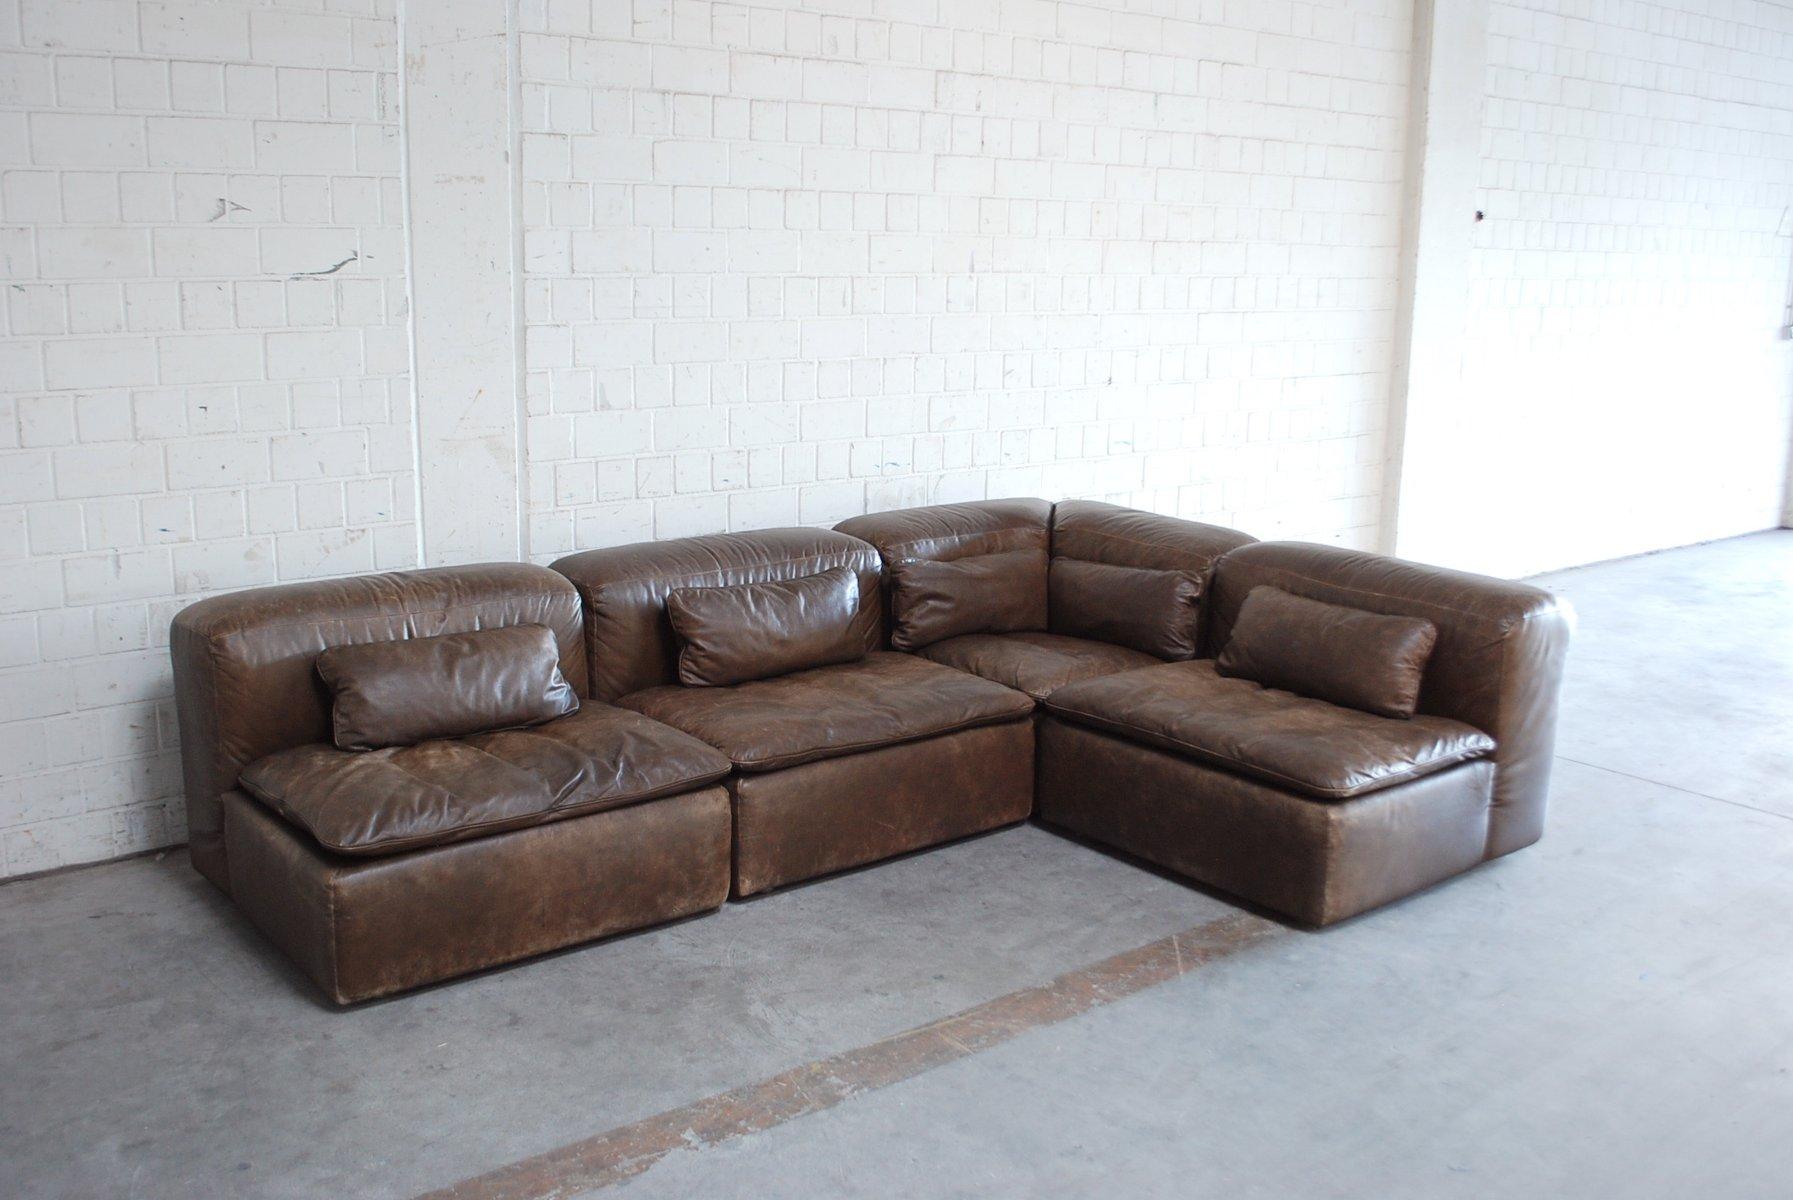 wk mbel sthle amazing mobel sofa sofa sofa ix mobel sofa berlin with wk mbel sthle perfect. Black Bedroom Furniture Sets. Home Design Ideas